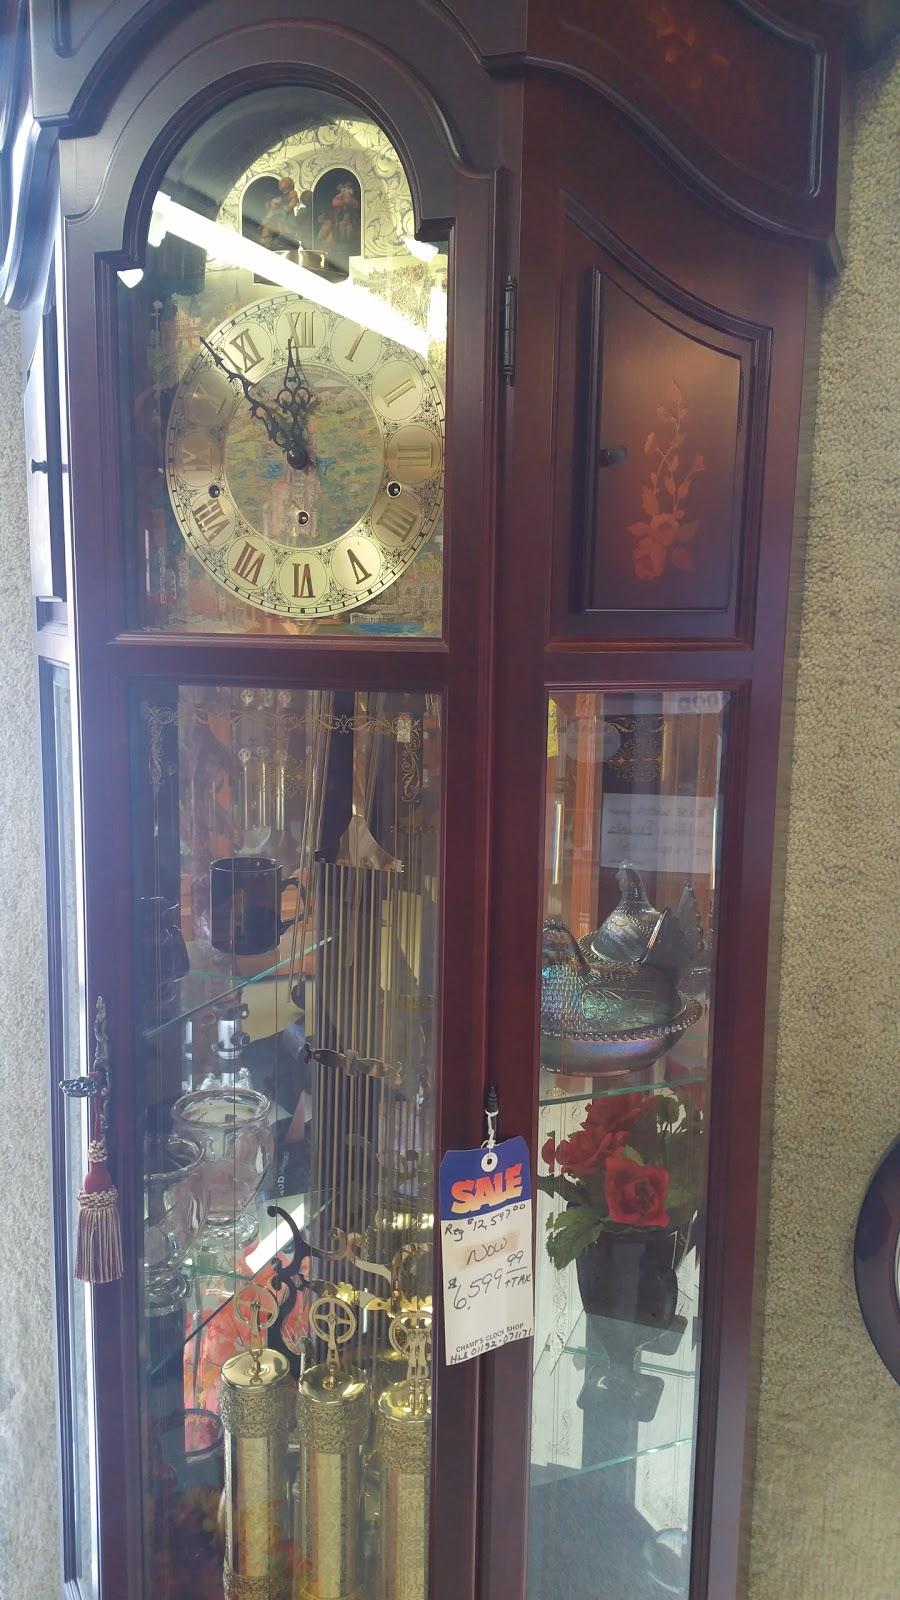 Champs Clock Shop - museum    Photo 1 of 10   Address: 3834 King Dr, Douglasville, GA 30135, USA   Phone: (770) 942-2128